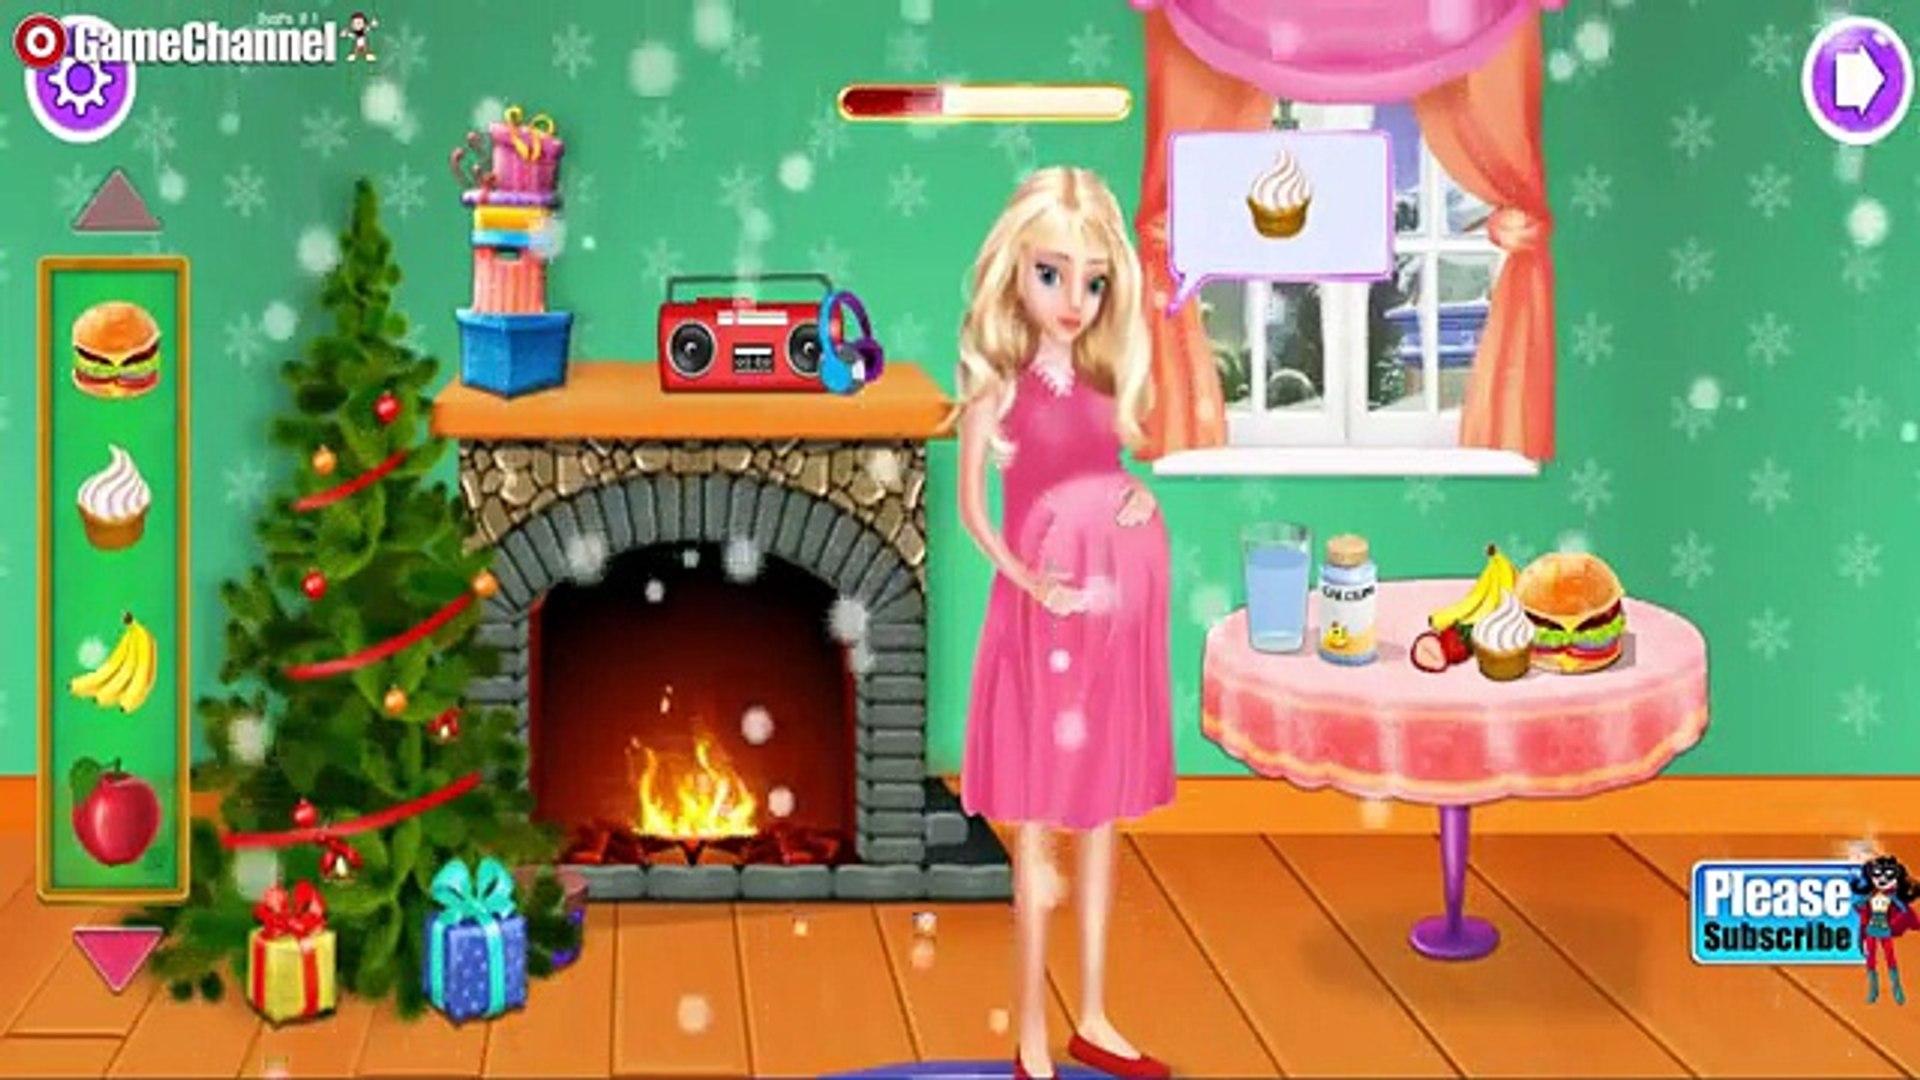 Little Santa Baby For Kids Educational Education Videos games for Kids - Girls - Baby Andr